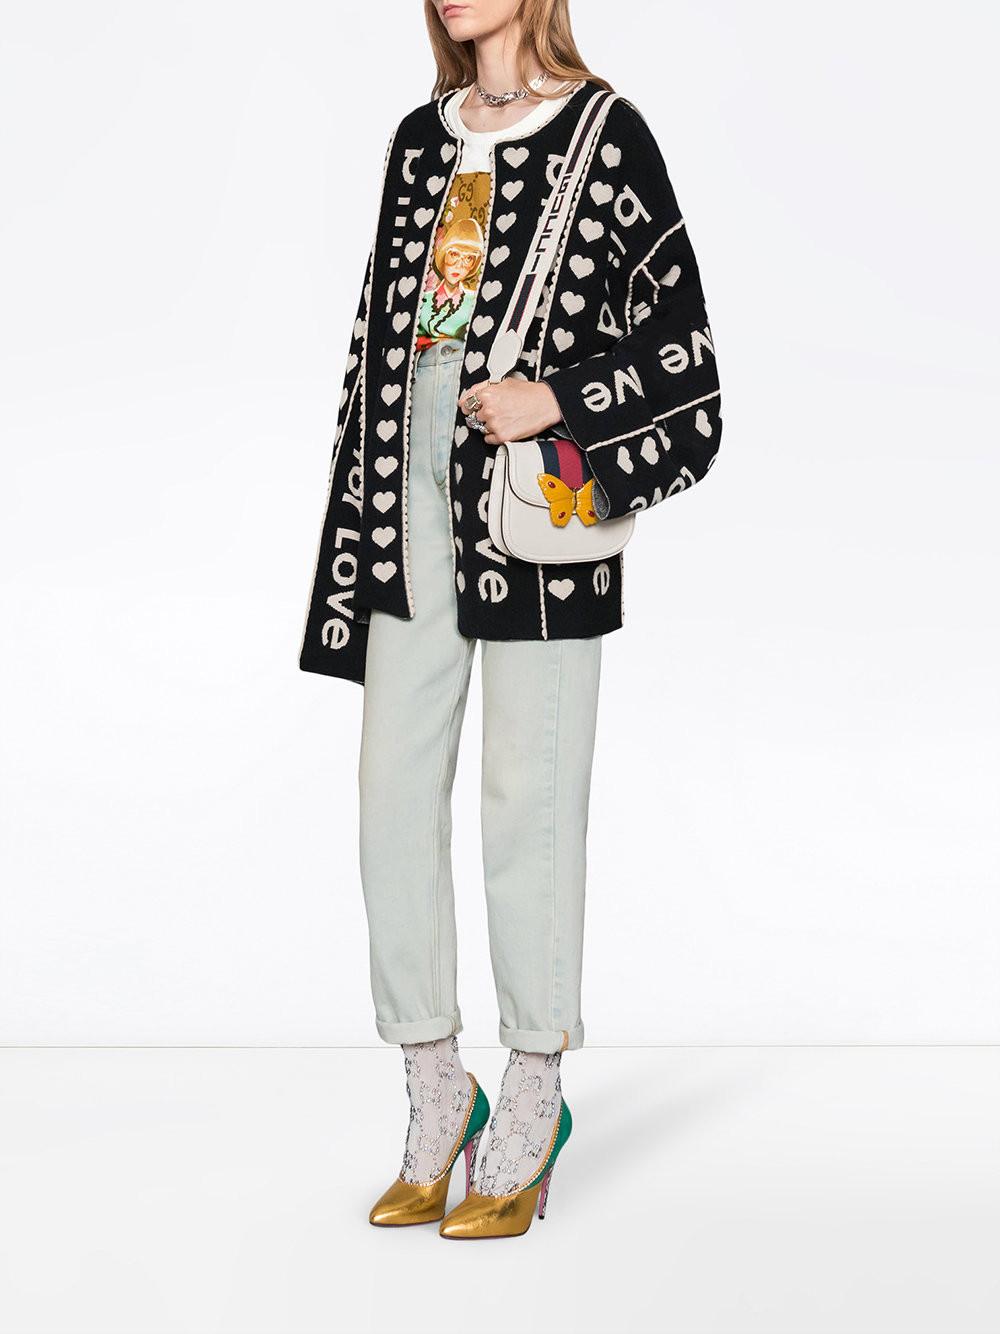 reiss Crew-neck knit dress